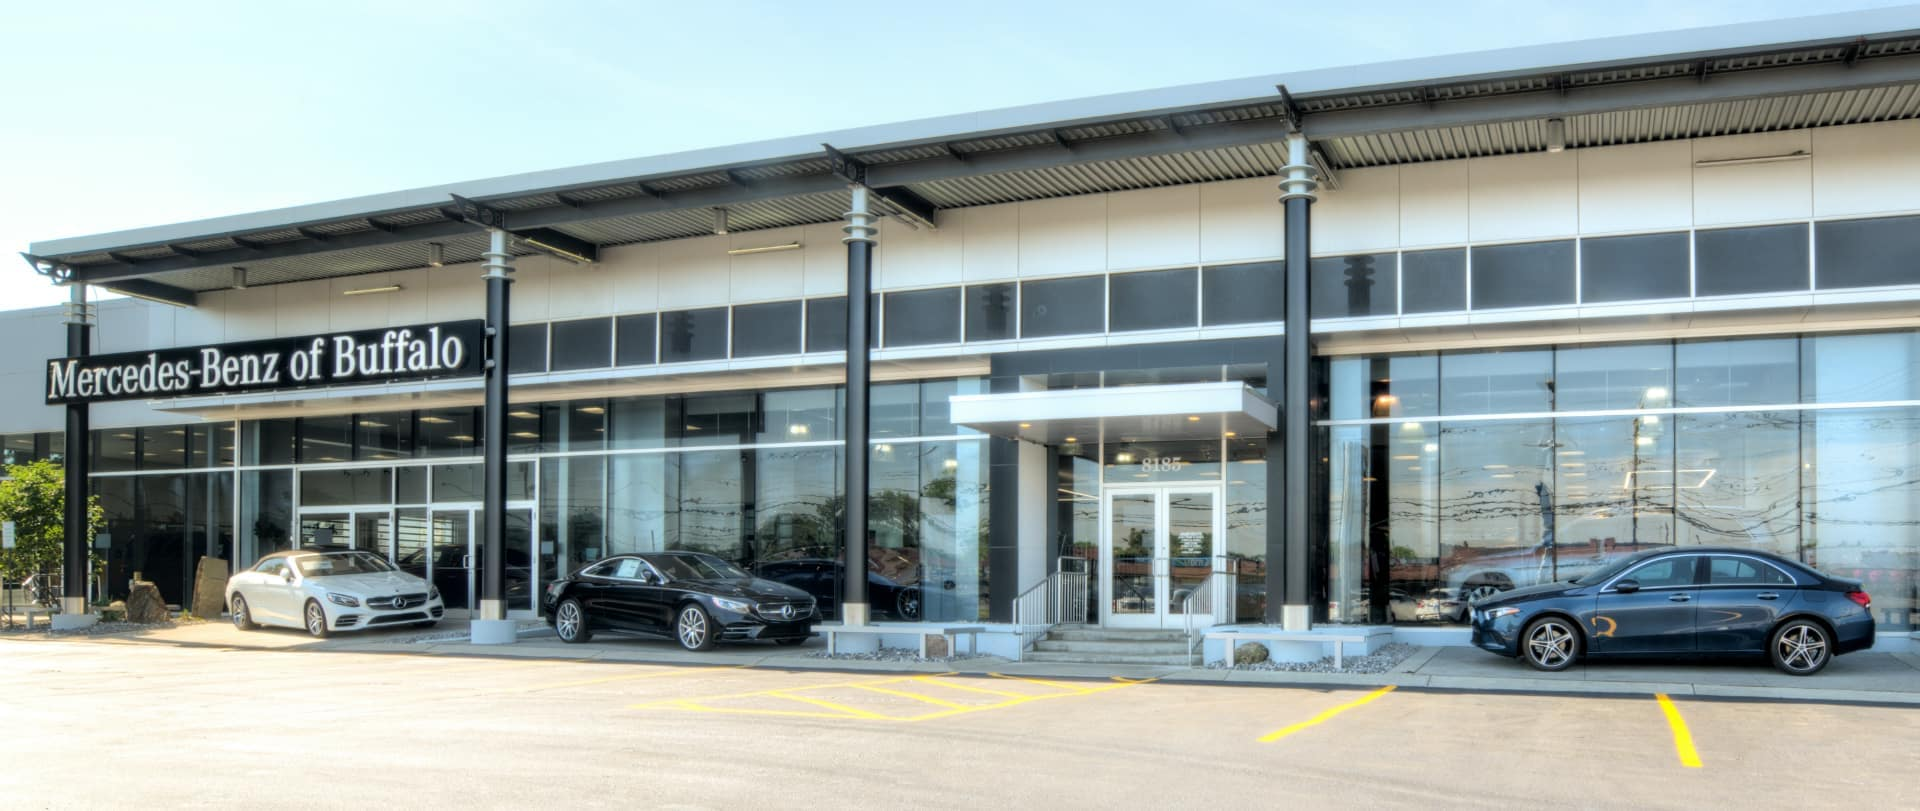 Mercedes Benz Dealers In Nj >> Mercedes Benz Of Buffalo Mercedes Benz Dealer In